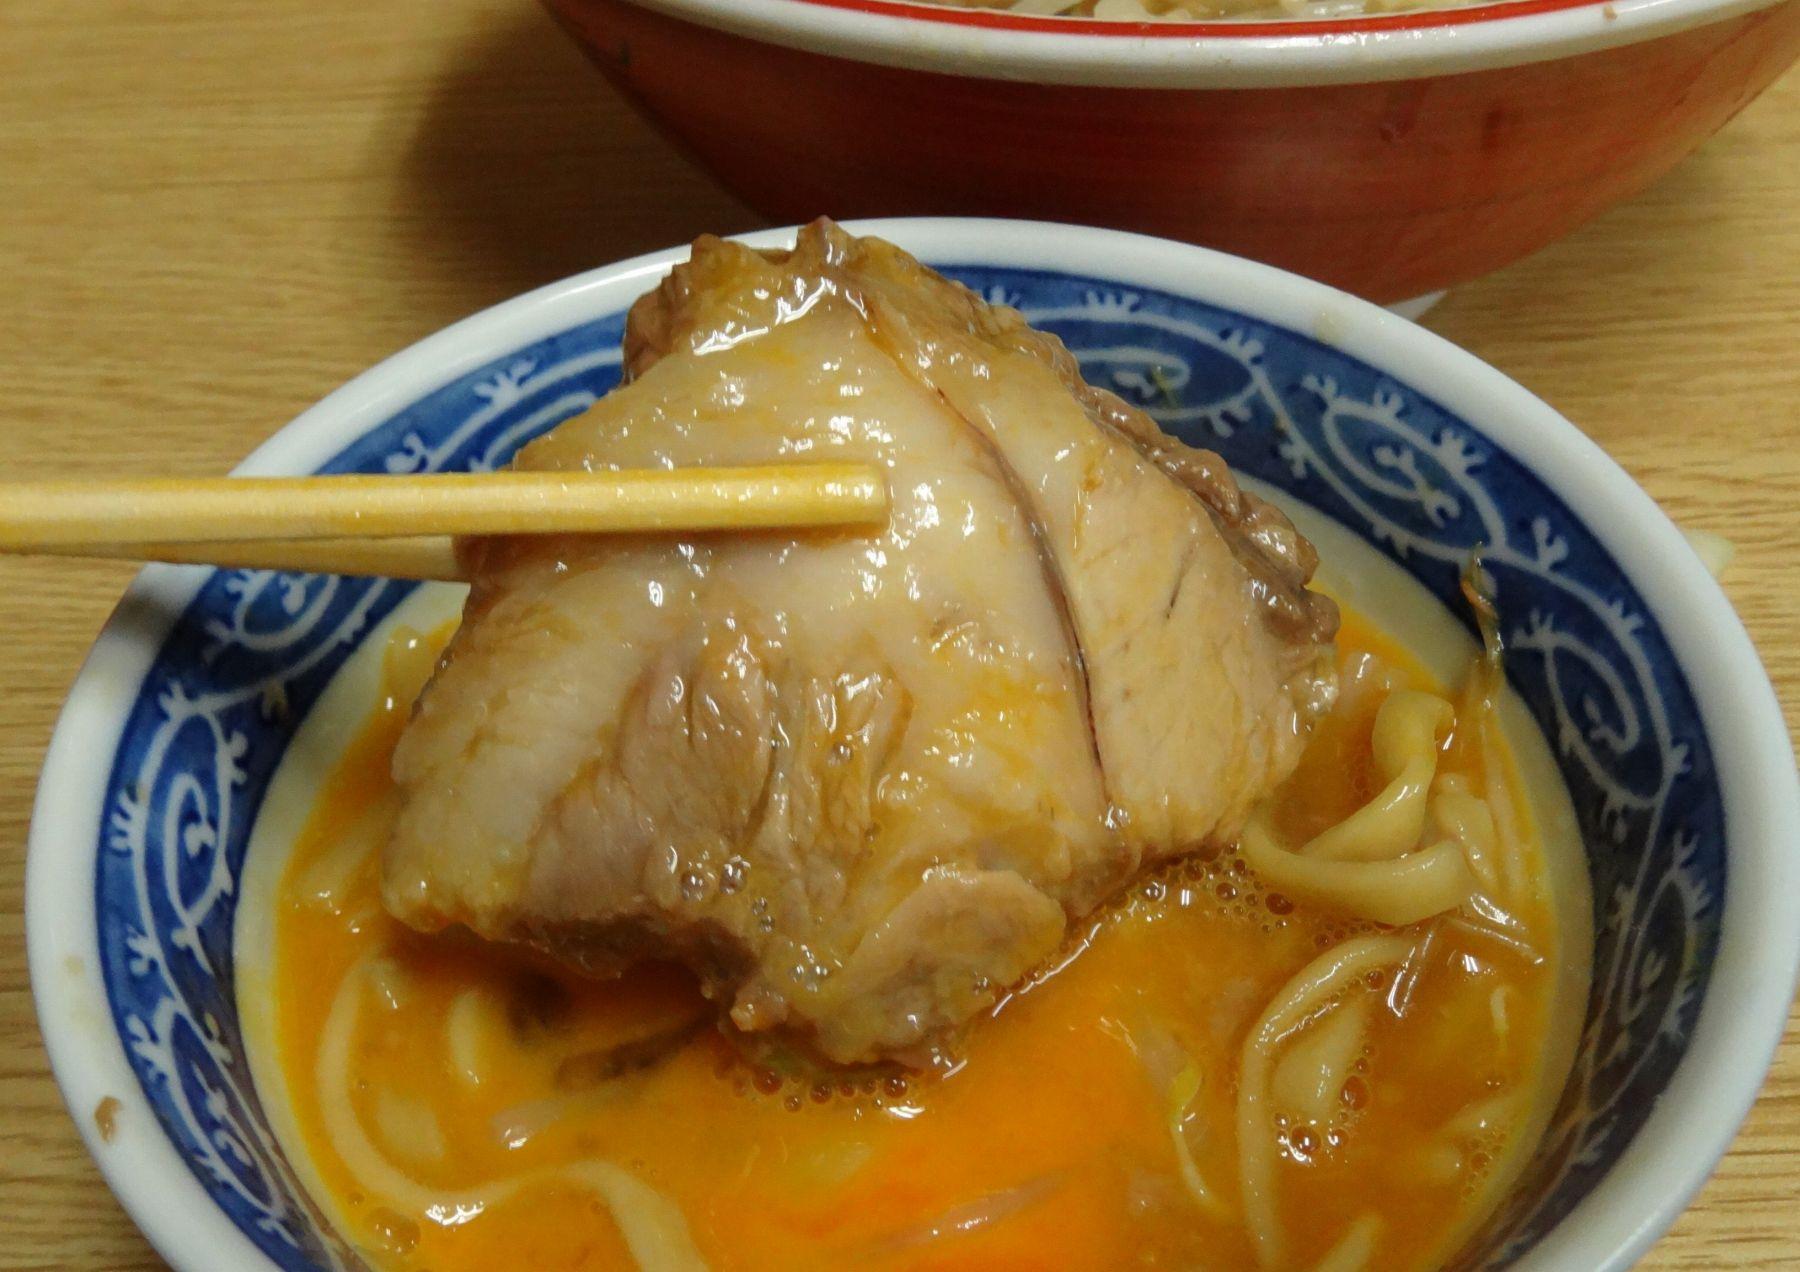 20121130016tochigi.jpg